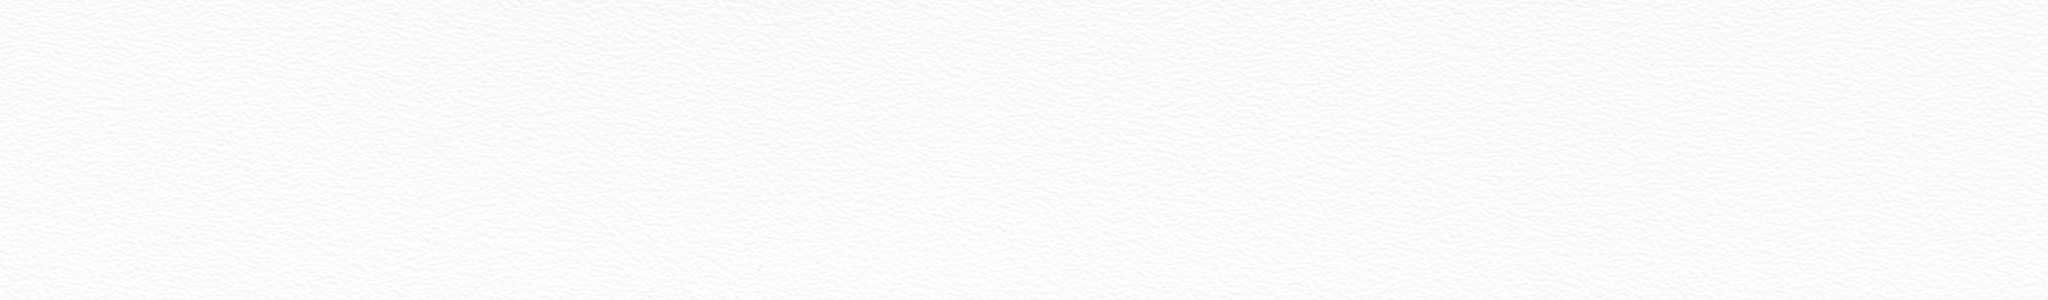 HU 101209 Кромка ABS Королевский Белый - Шагрень XG